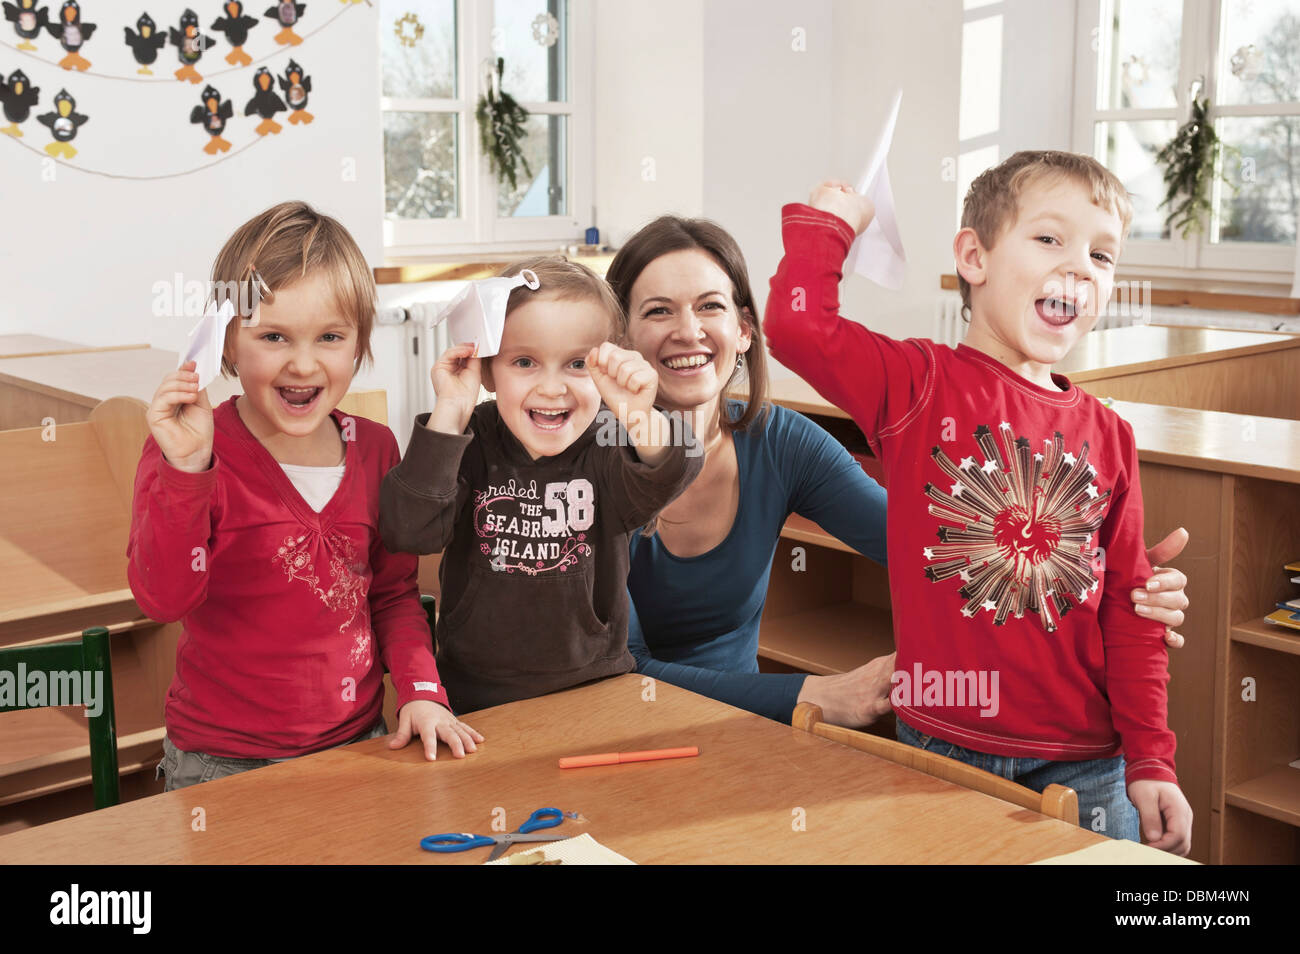 Children In Nursery School Holding Paper Planes, Kottgeisering, Bavaria, Germany, Europe - Stock Image